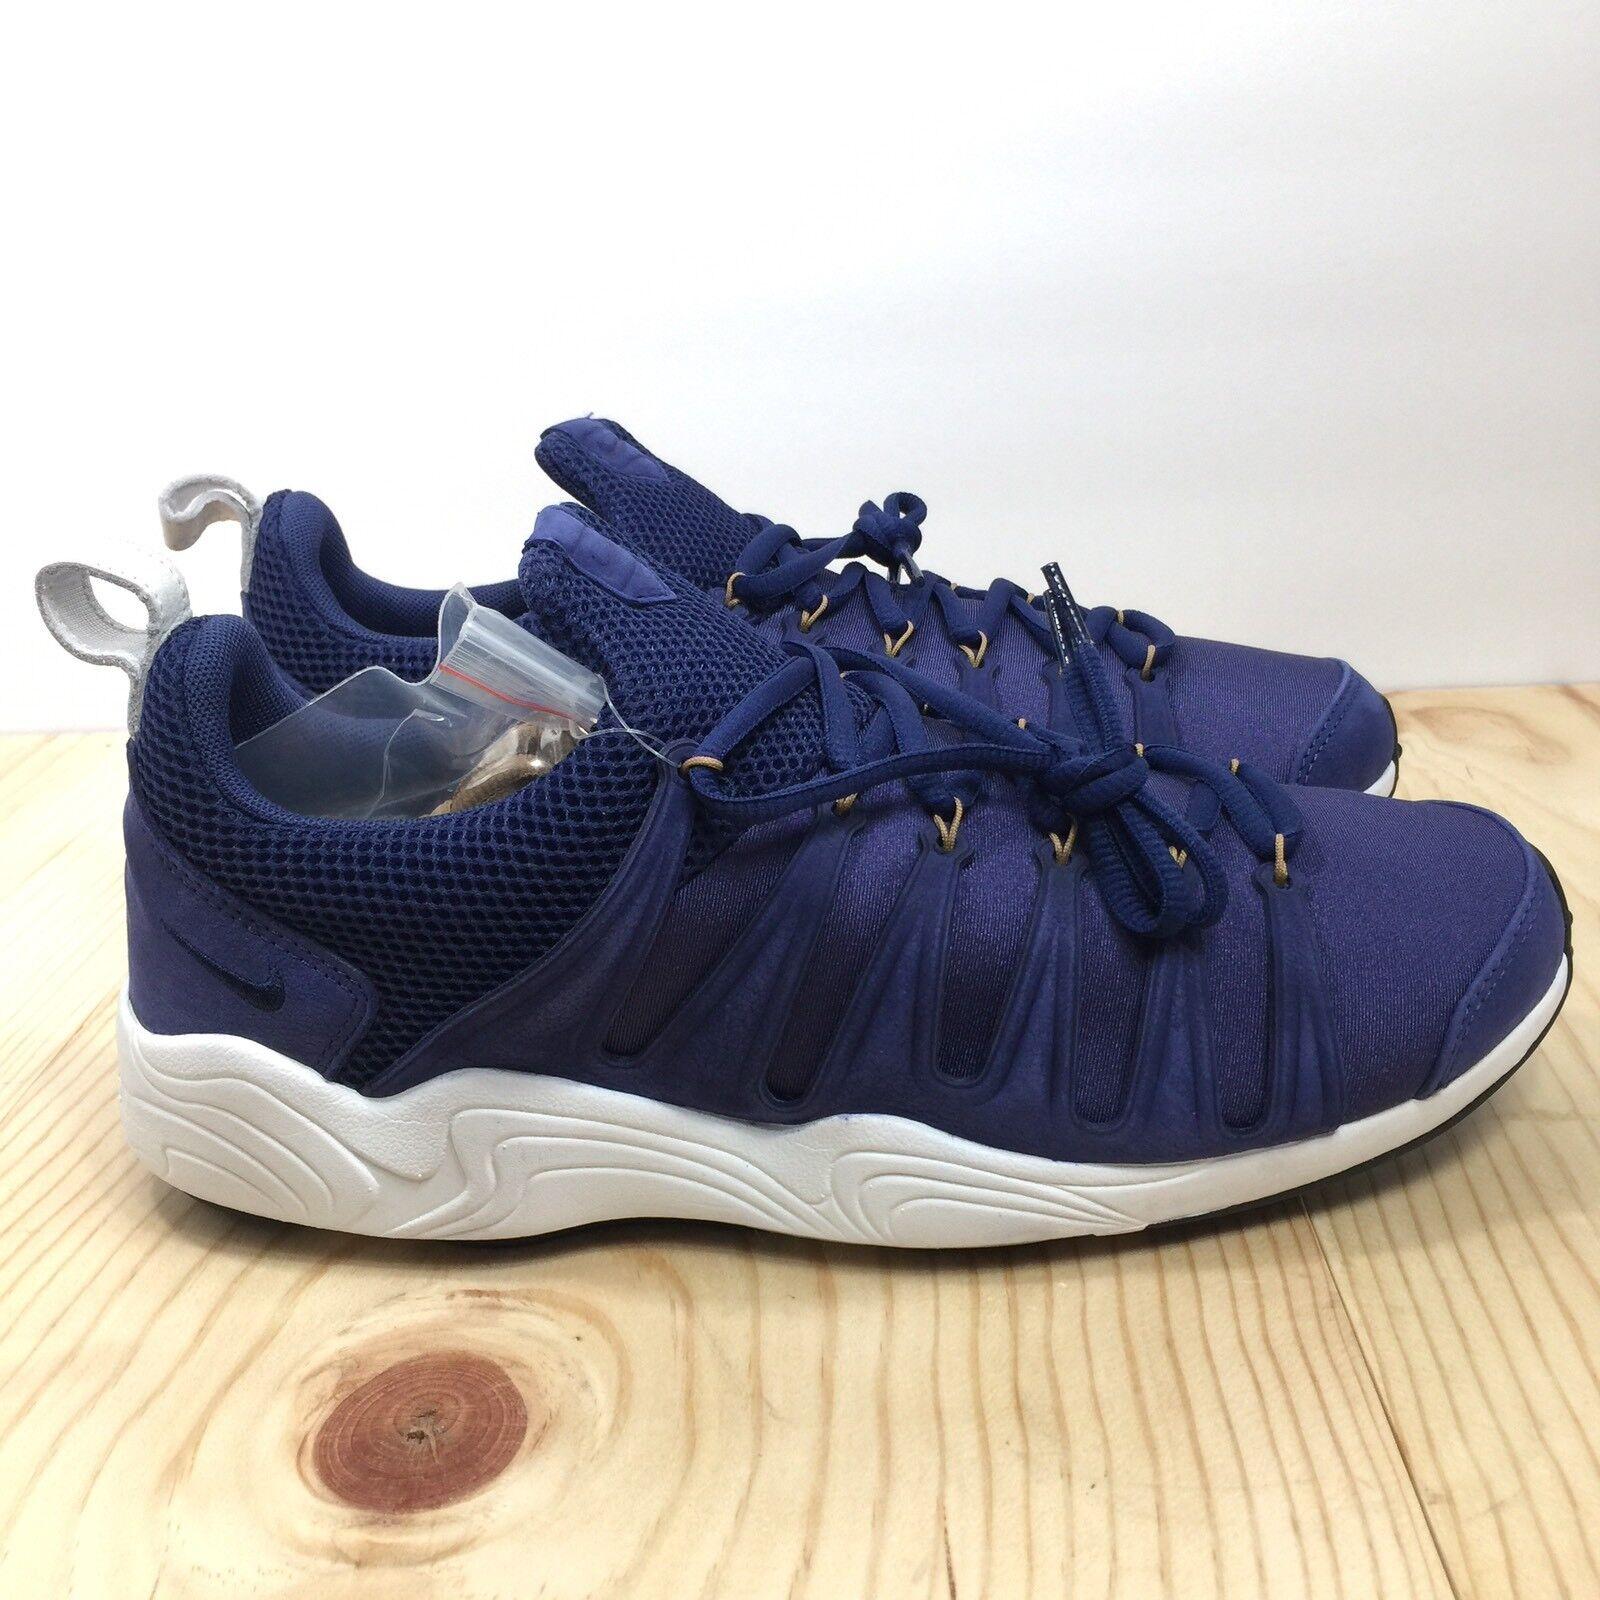 Nike air zoom Uomo spirimic dimensioni 9.5 scarpe Uomo zoom bianco e blu f5c22f